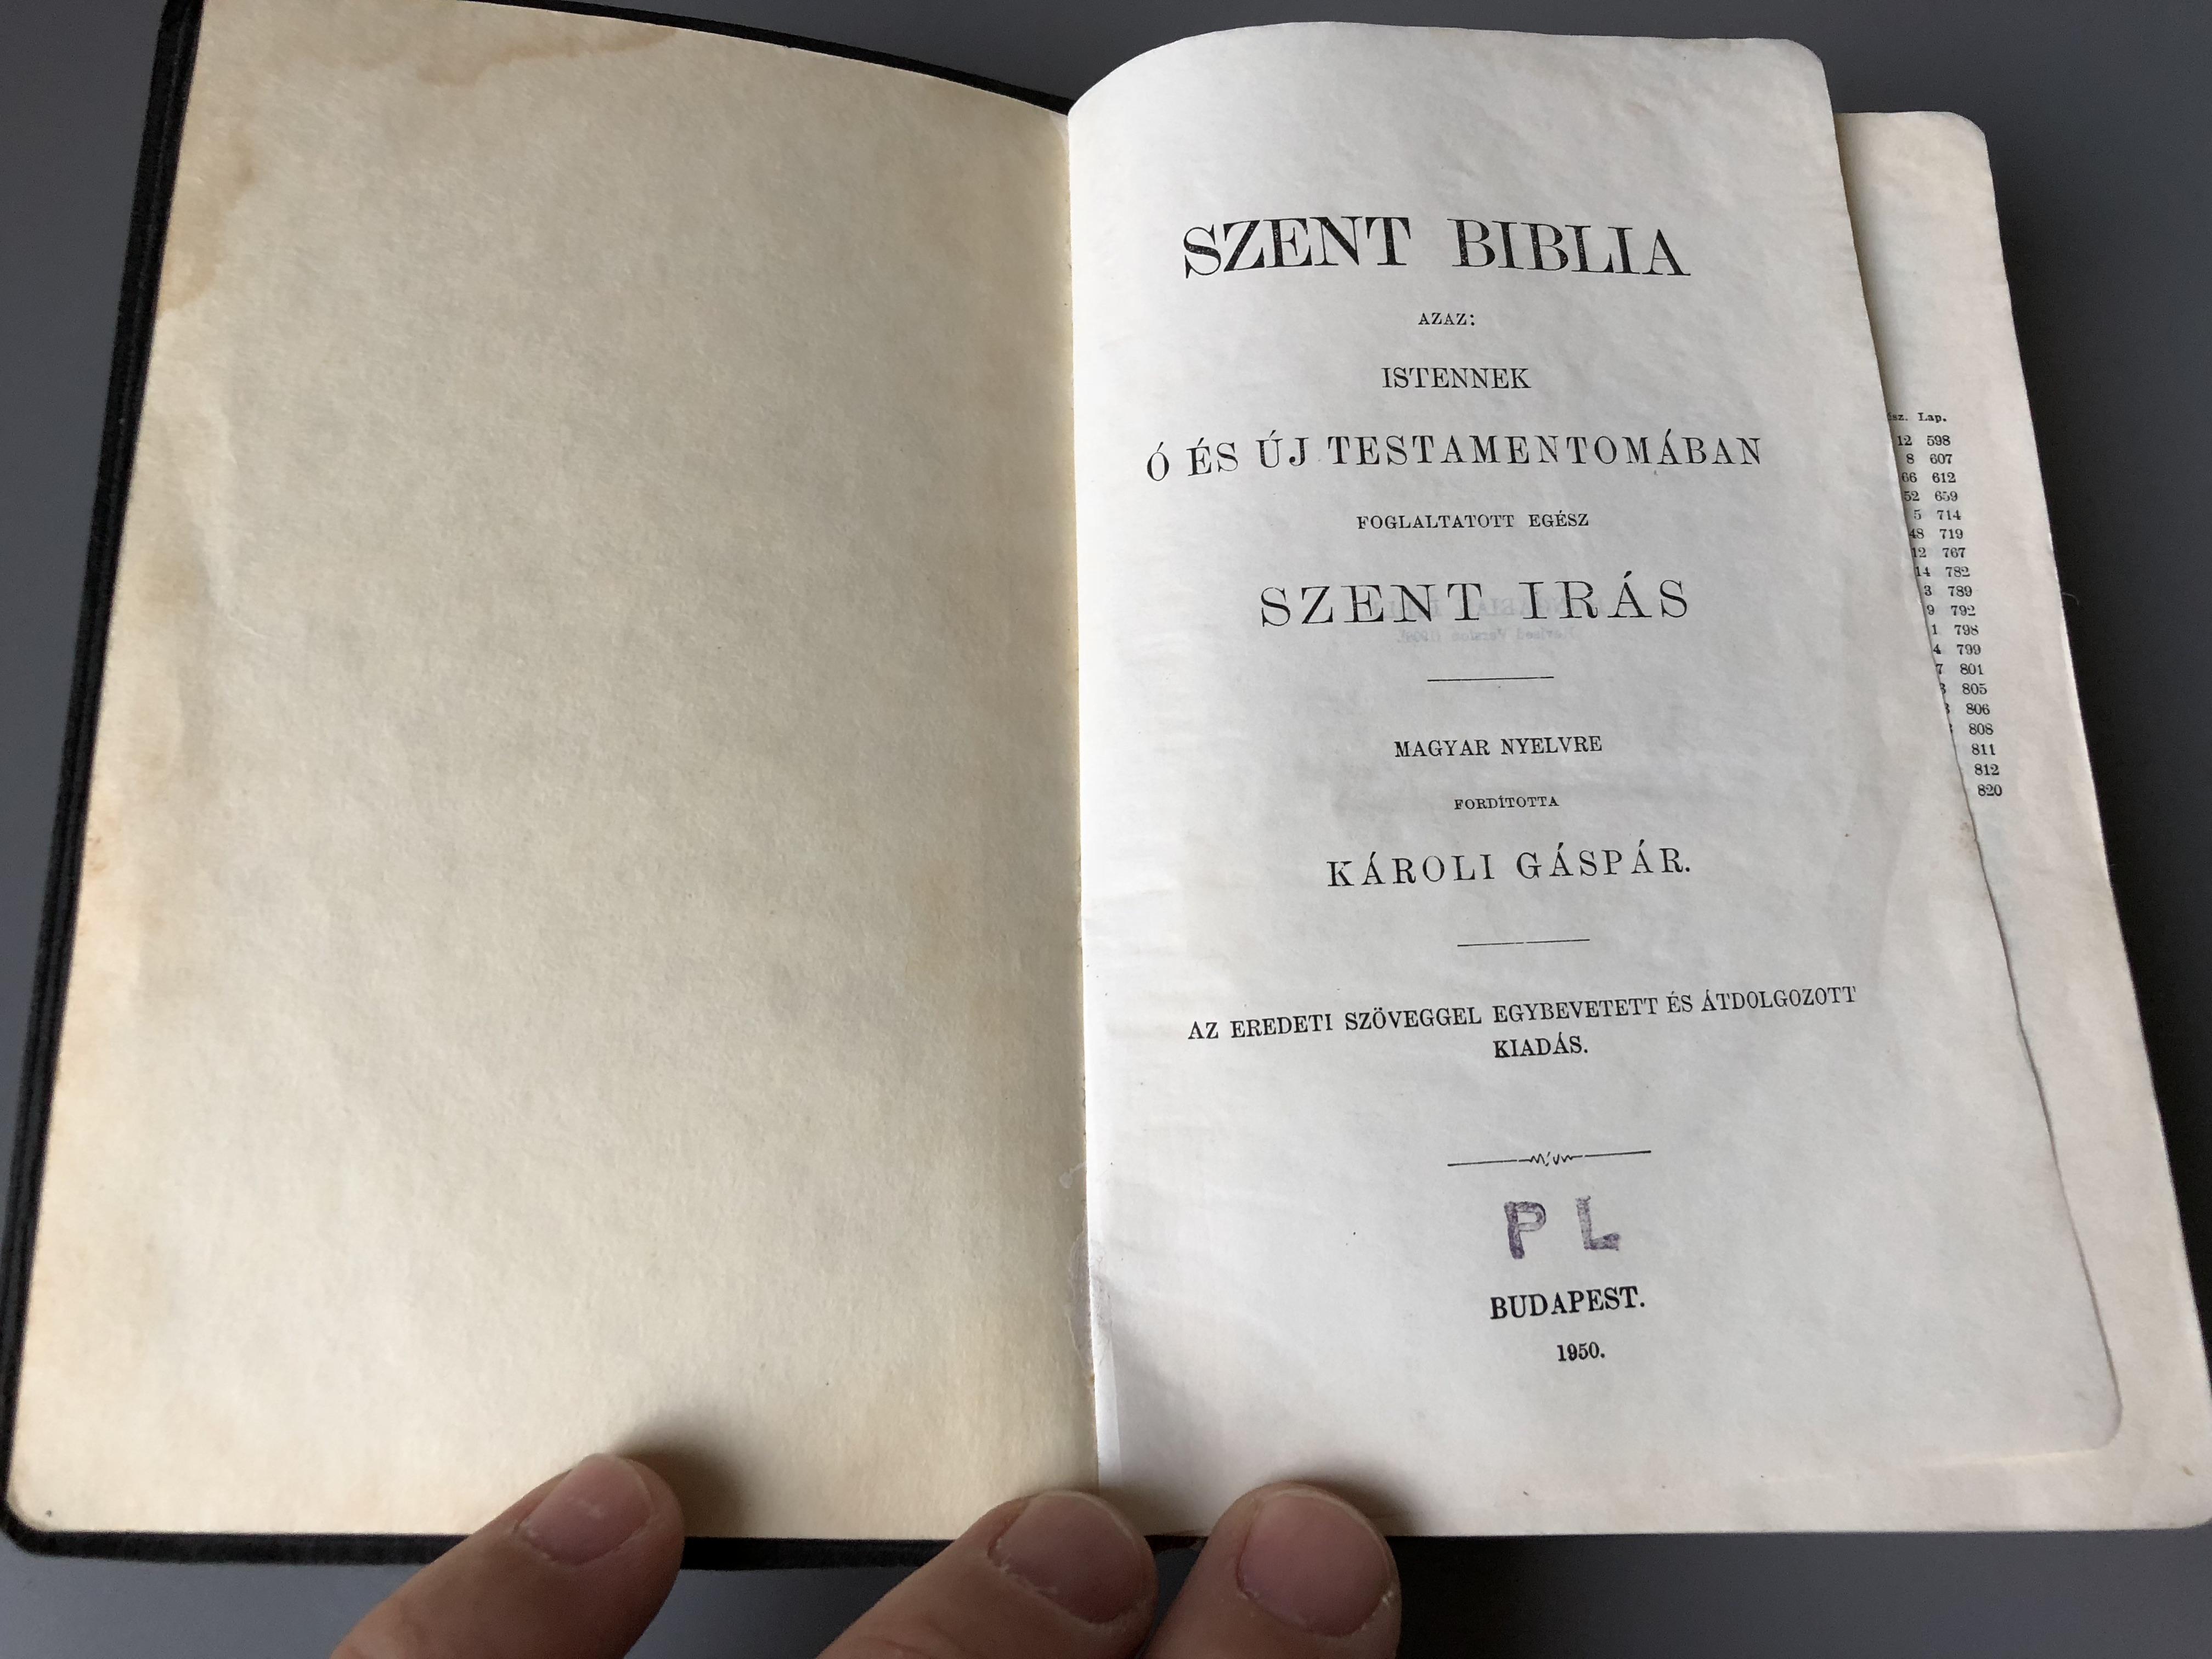 hungarian-bible-1950-szent-biblia-k-rolyi-g-sp-r-revised-hungarian-version-text-1908-4-.jpg